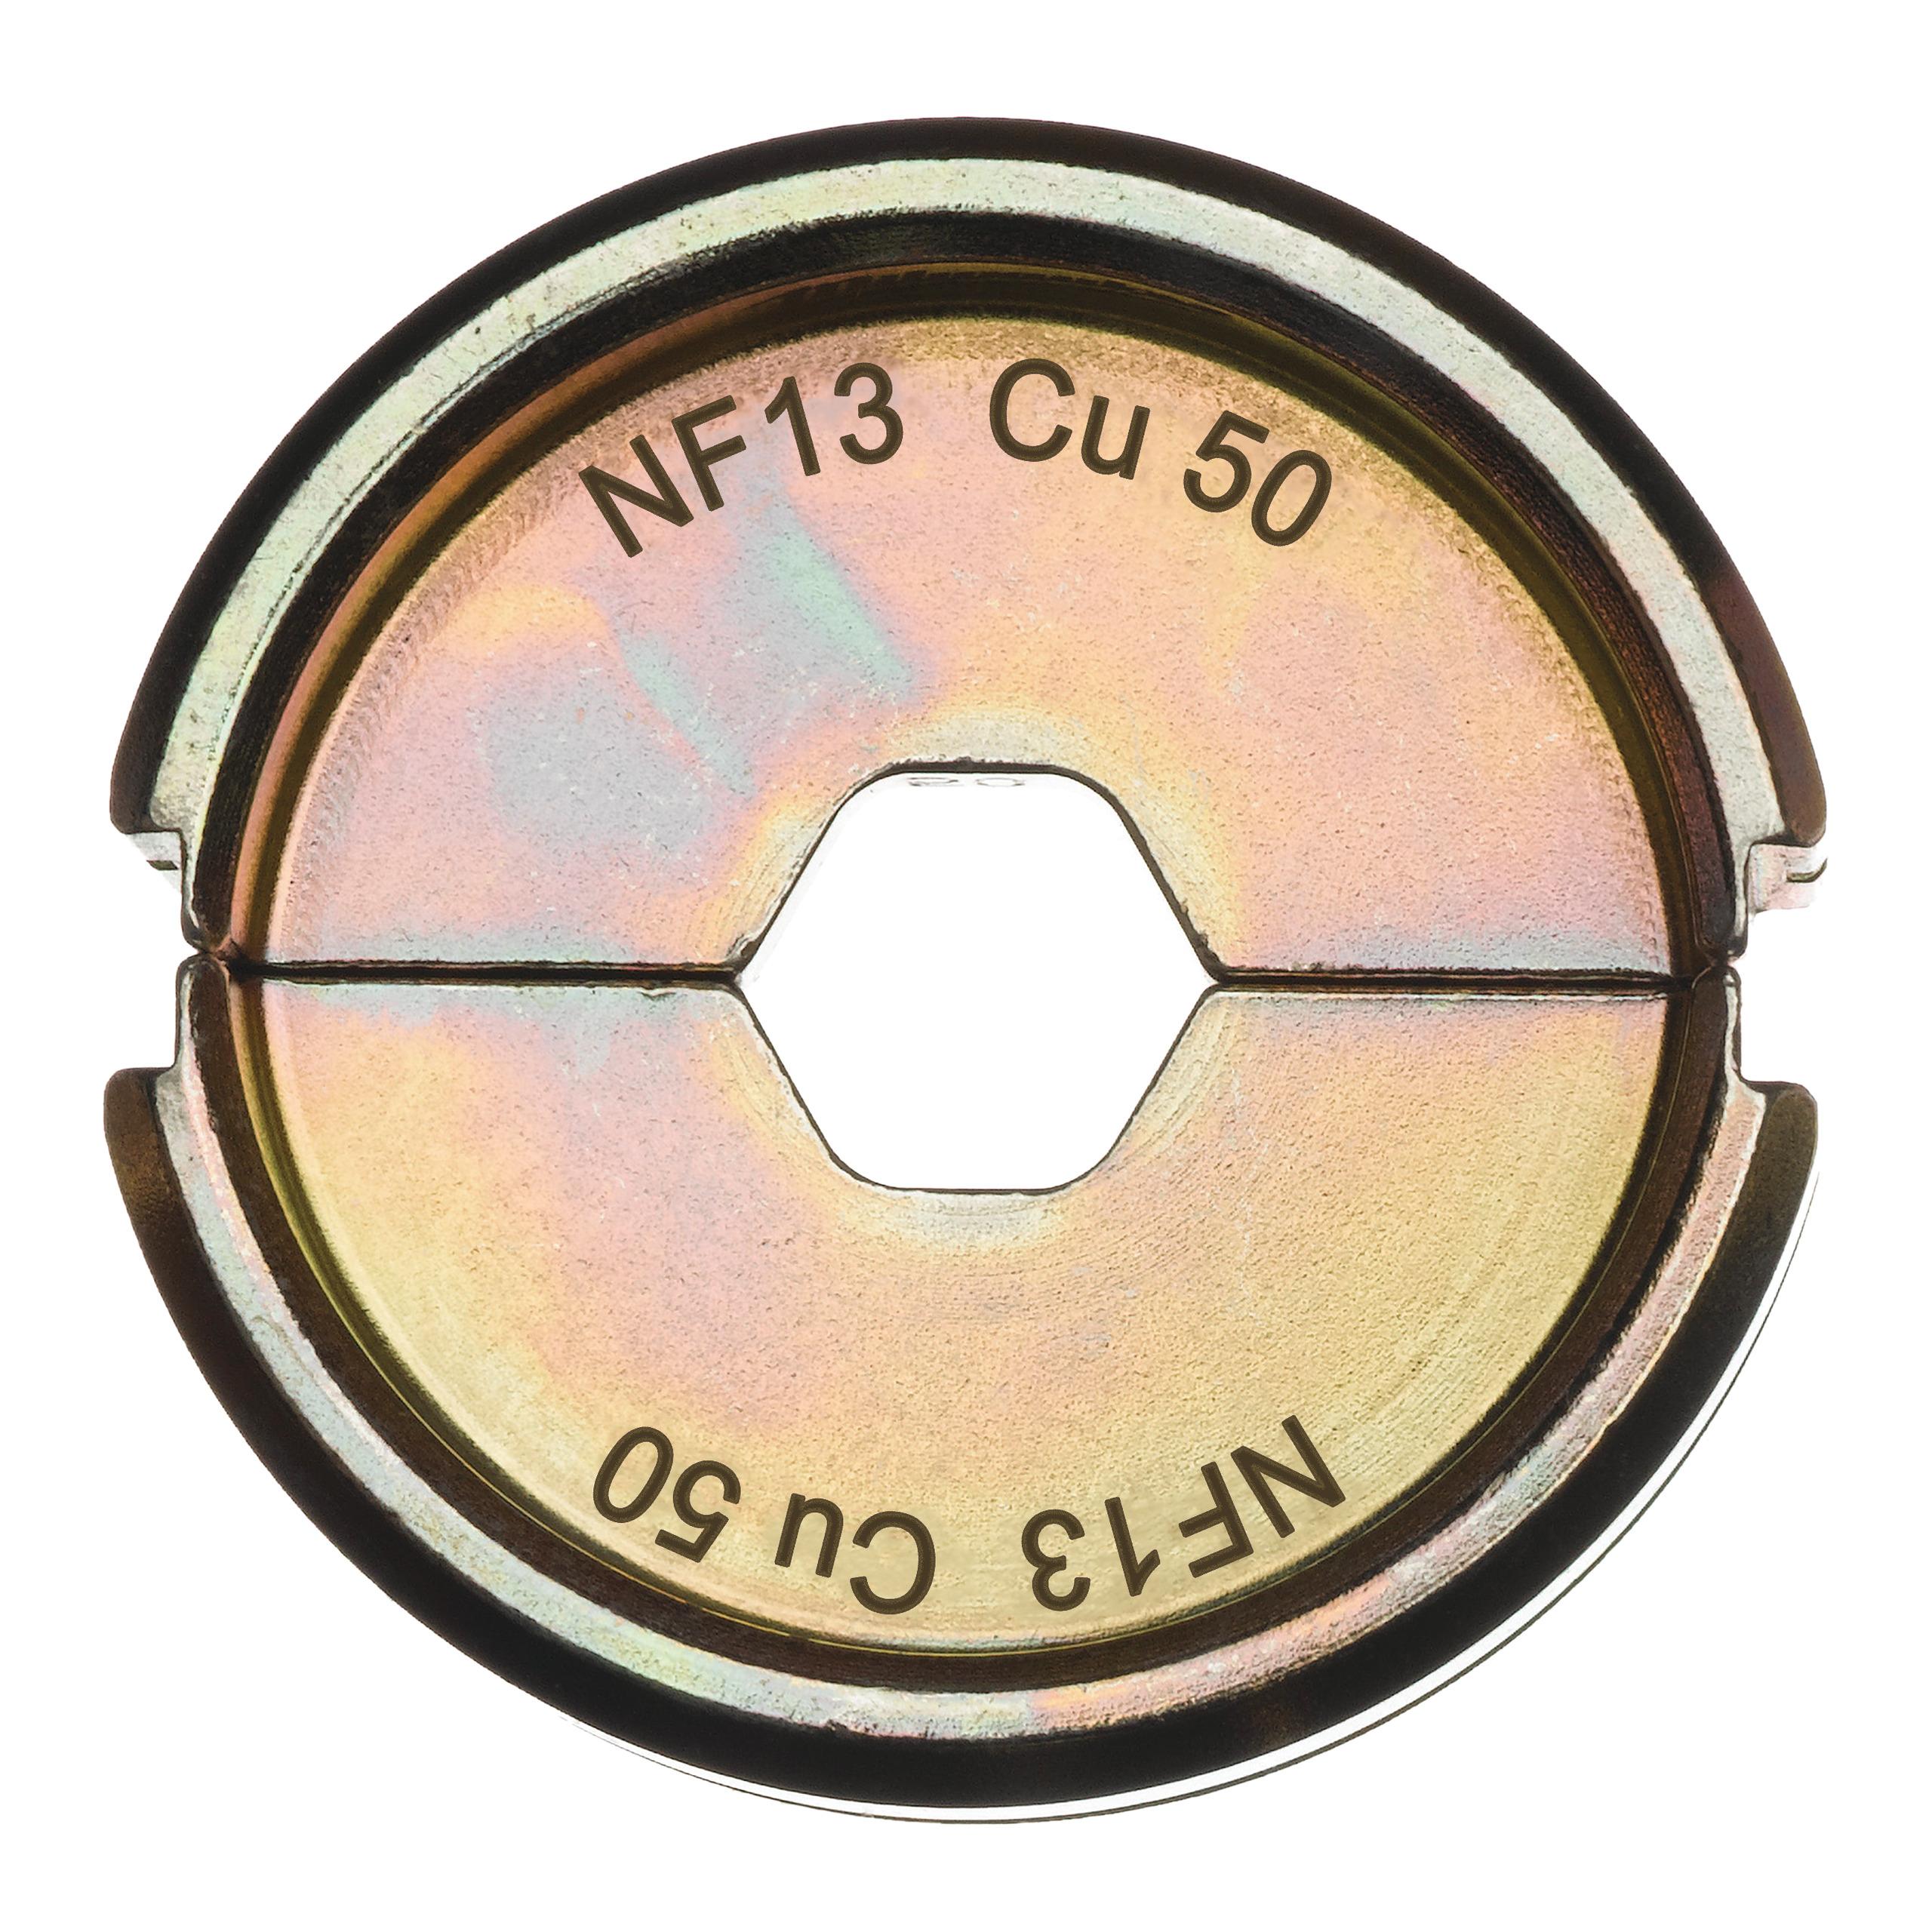 NF13 CU 50-1PC Pojistný kroužek